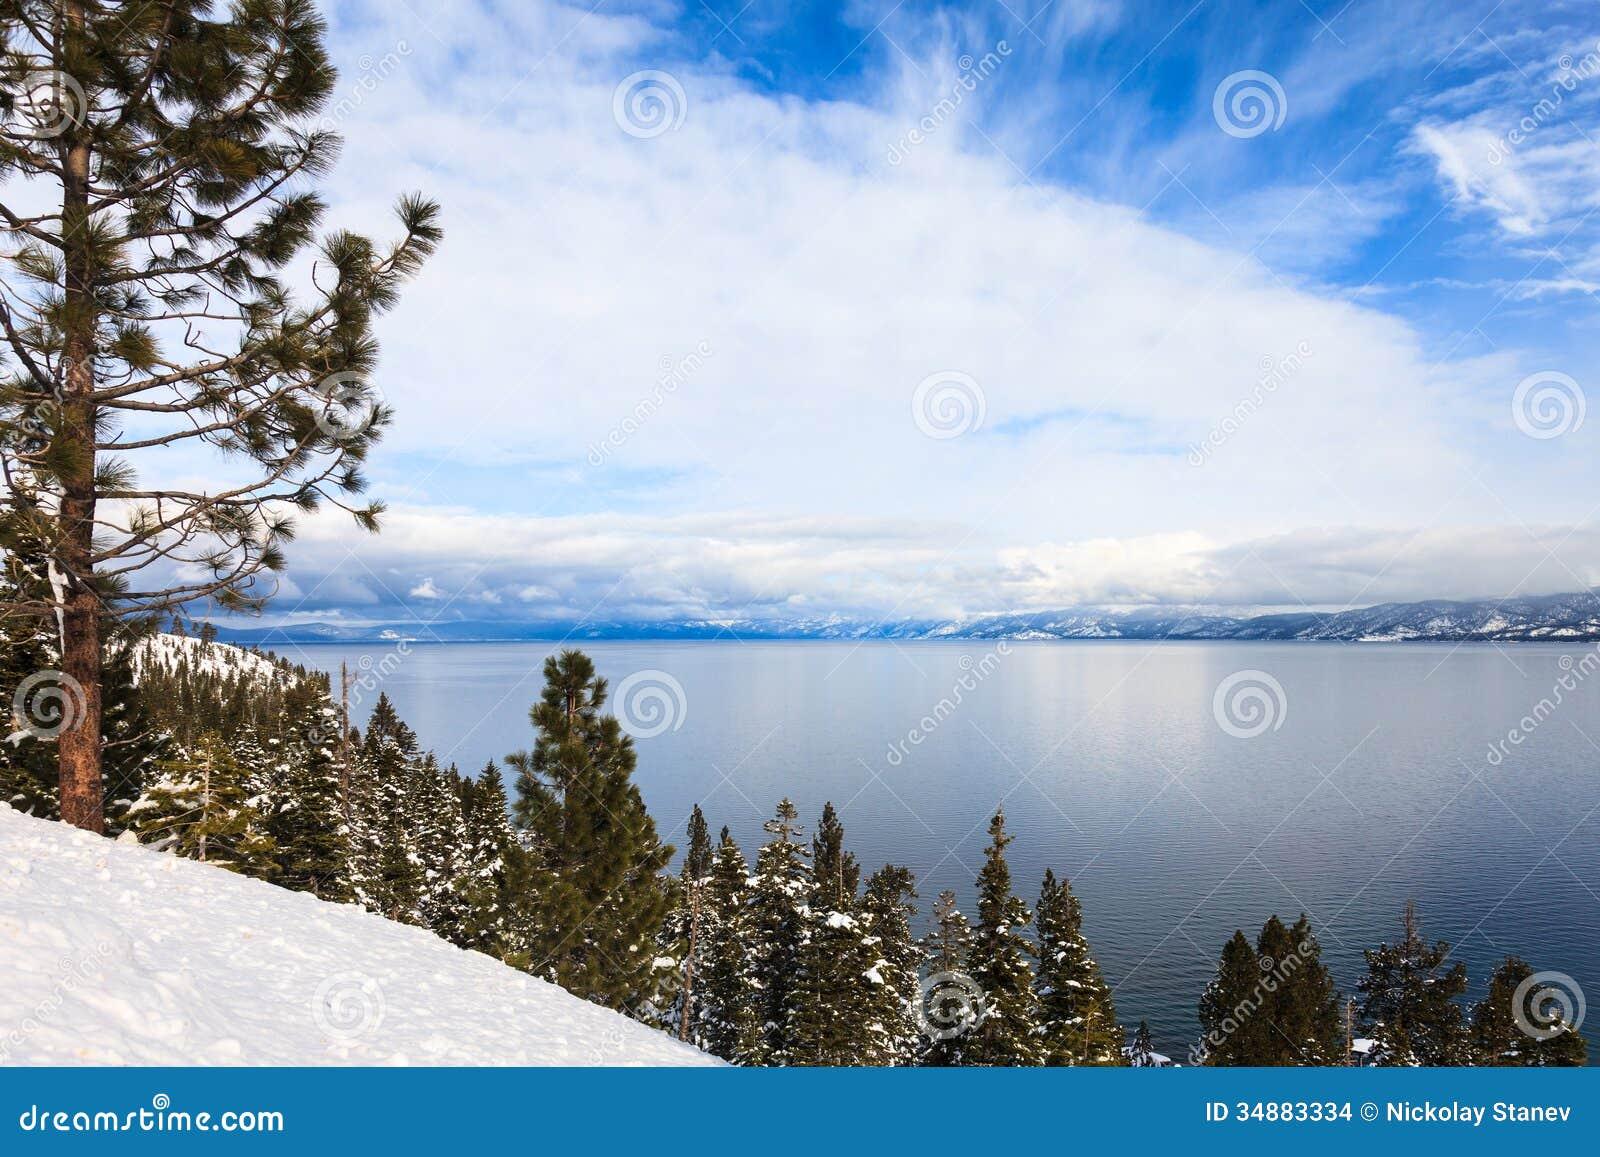 Lake Tahoe In Winter Stock Images - Image: 34883334